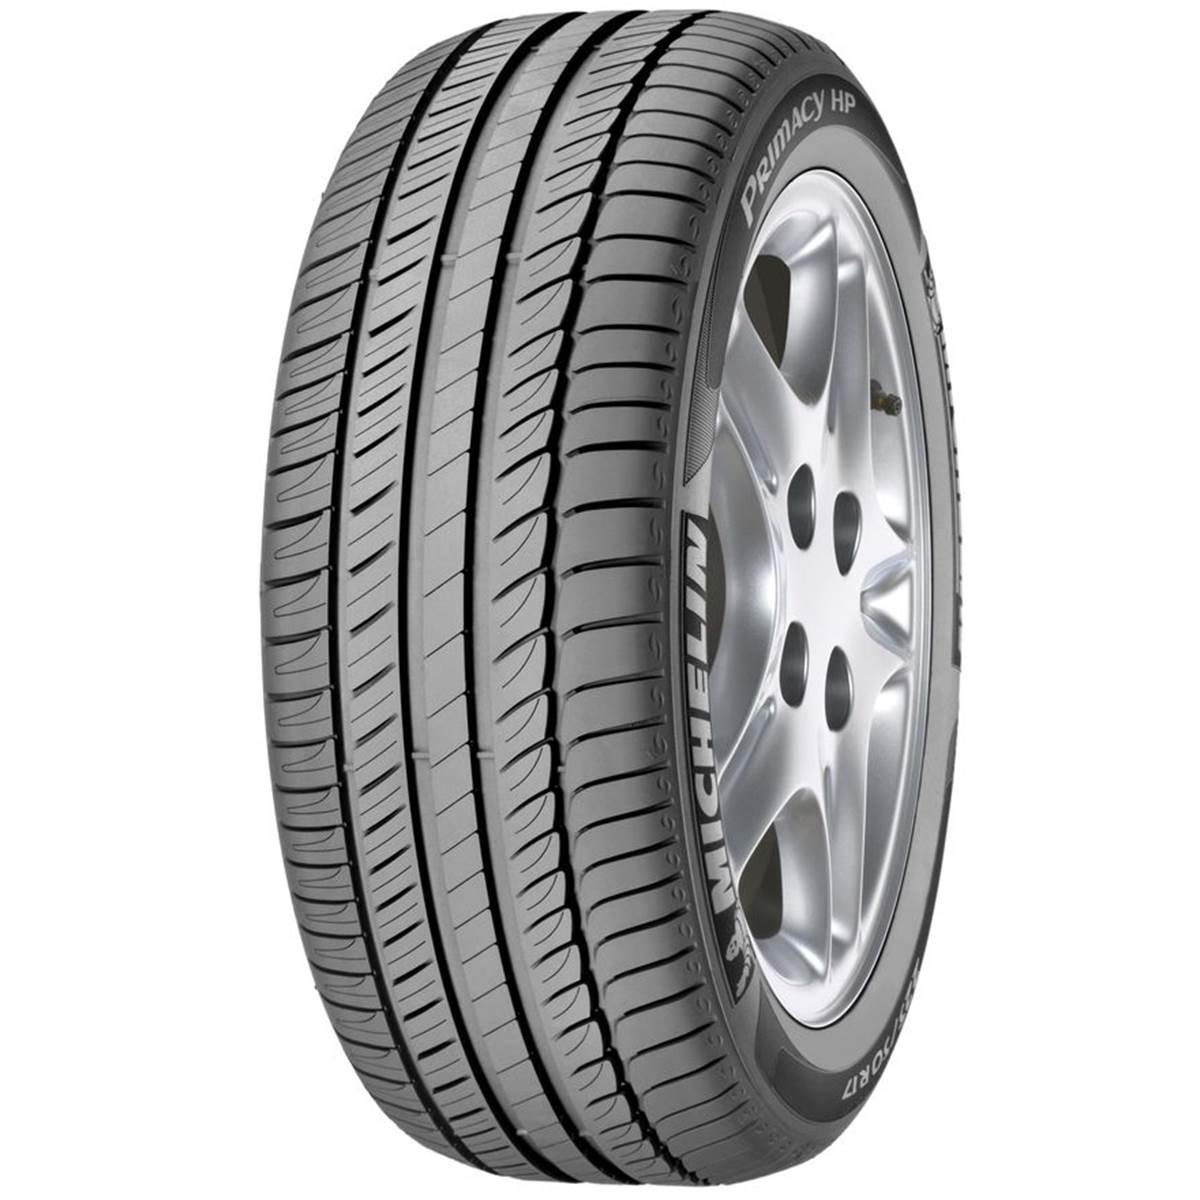 Pneu Michelin 245/45R17 95W Primacy Hp